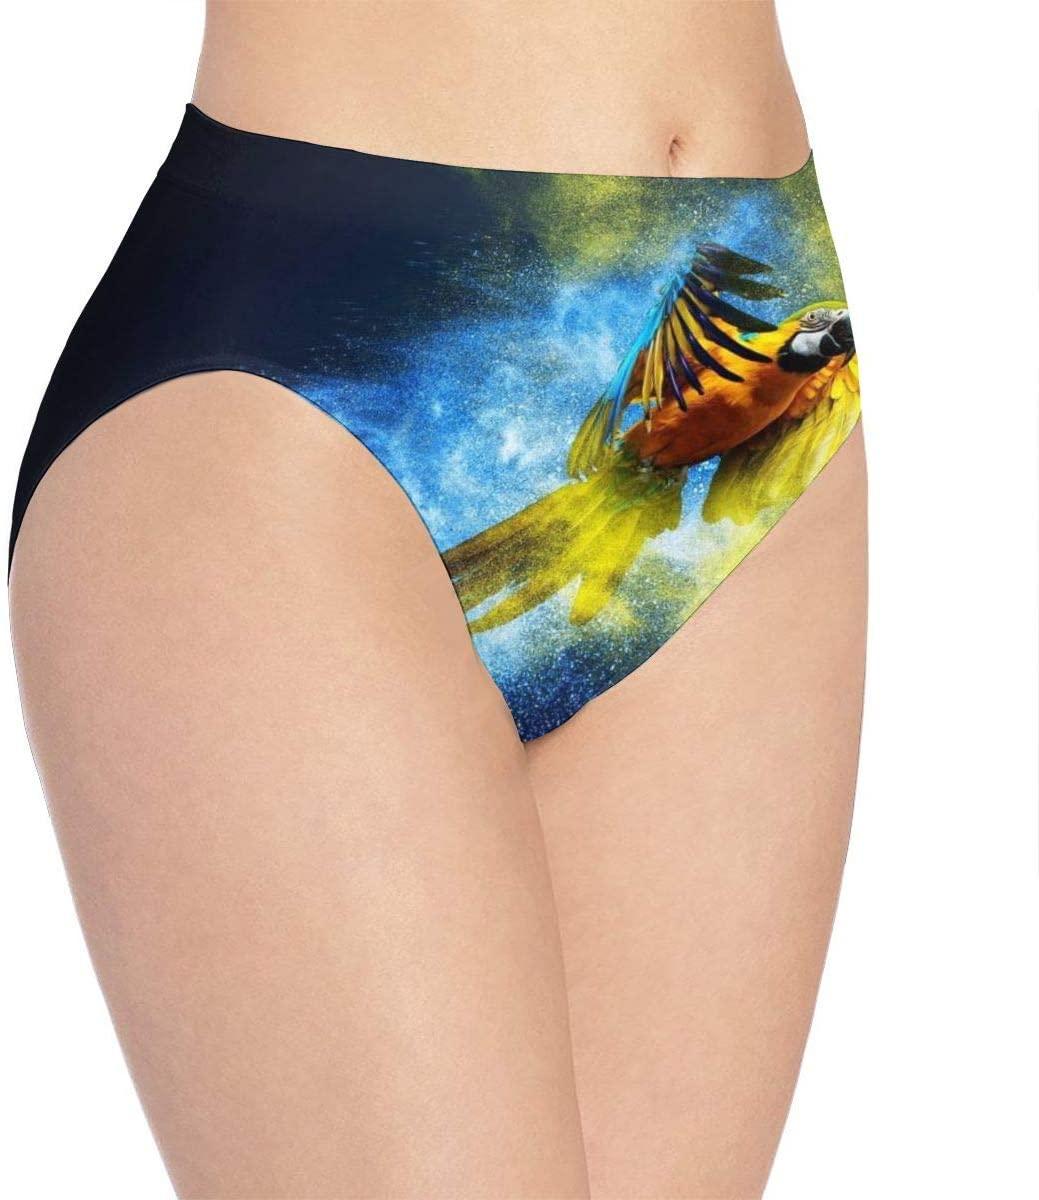 Kjaoi 3D Print Soft Women's Underwear, Bird Parrot Fashion Flirty Sexy Lady's Panties Briefs